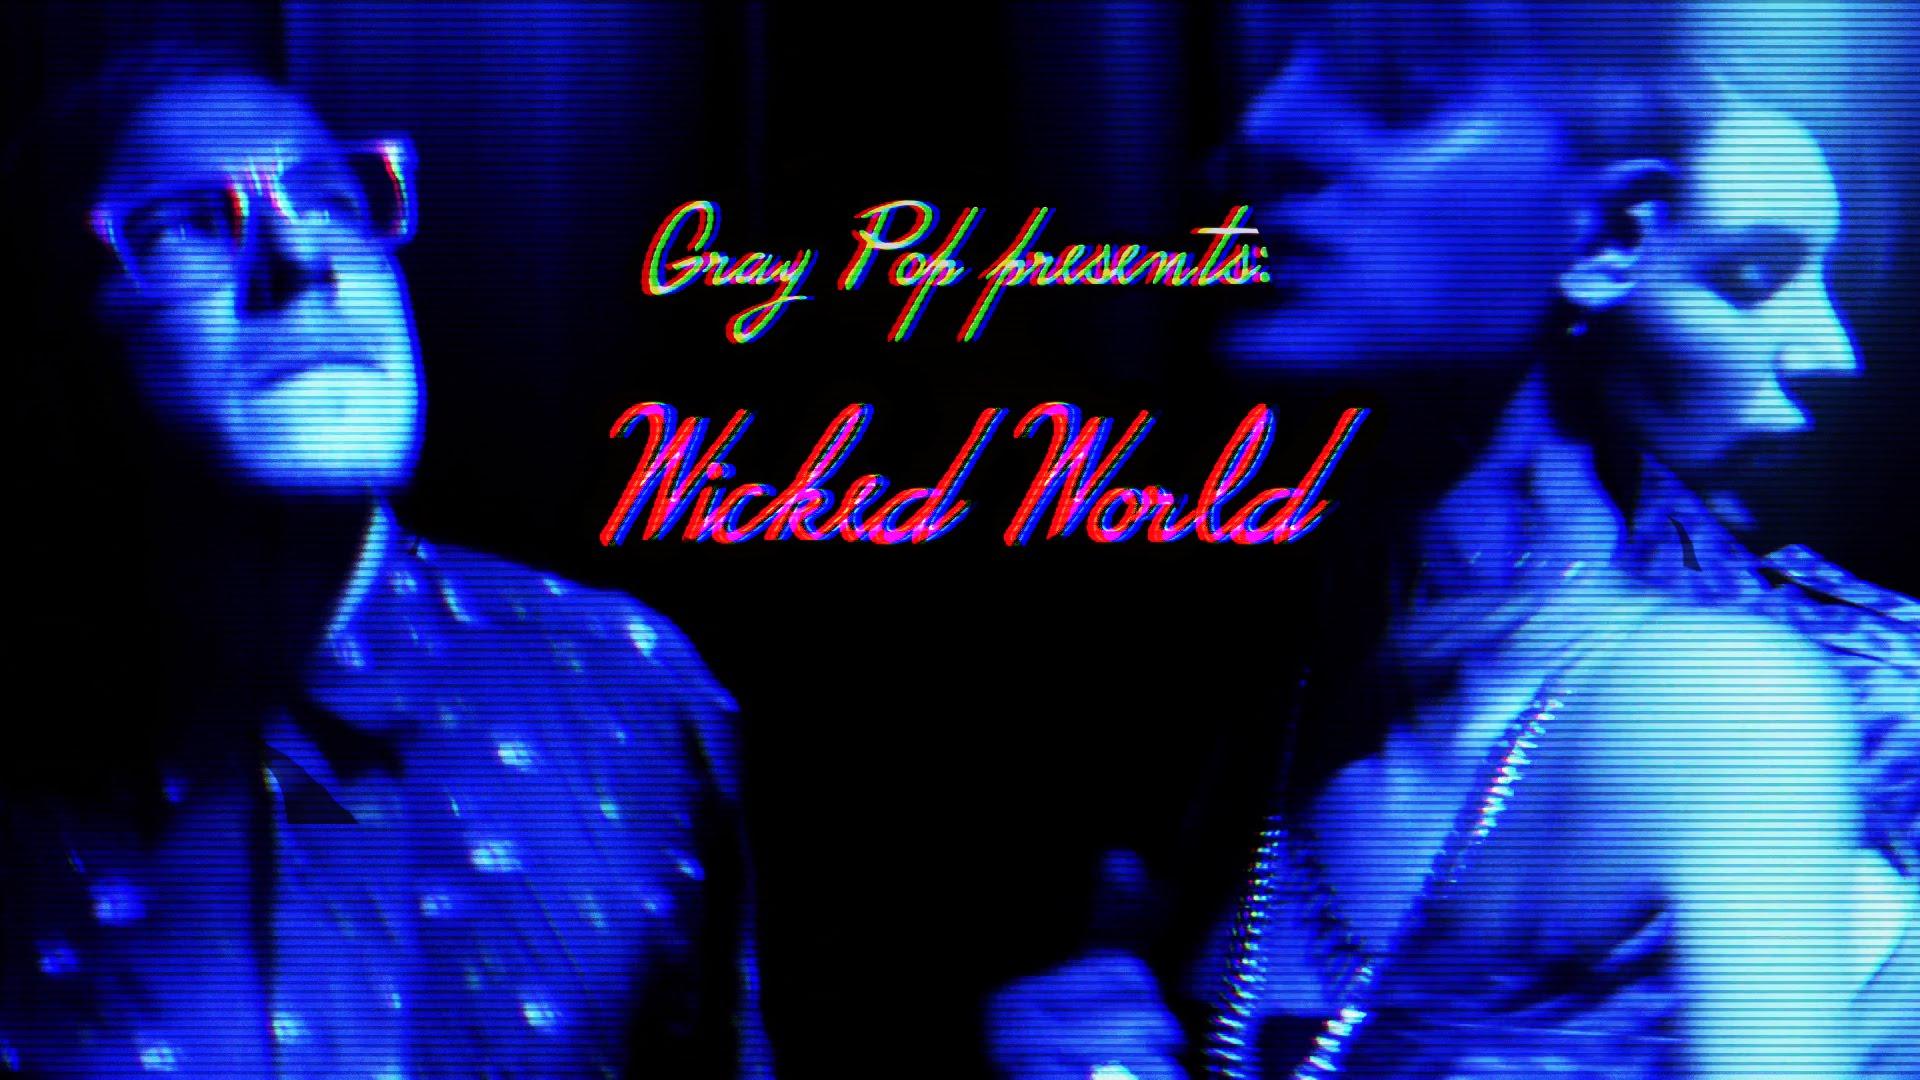 gray pop wicked world